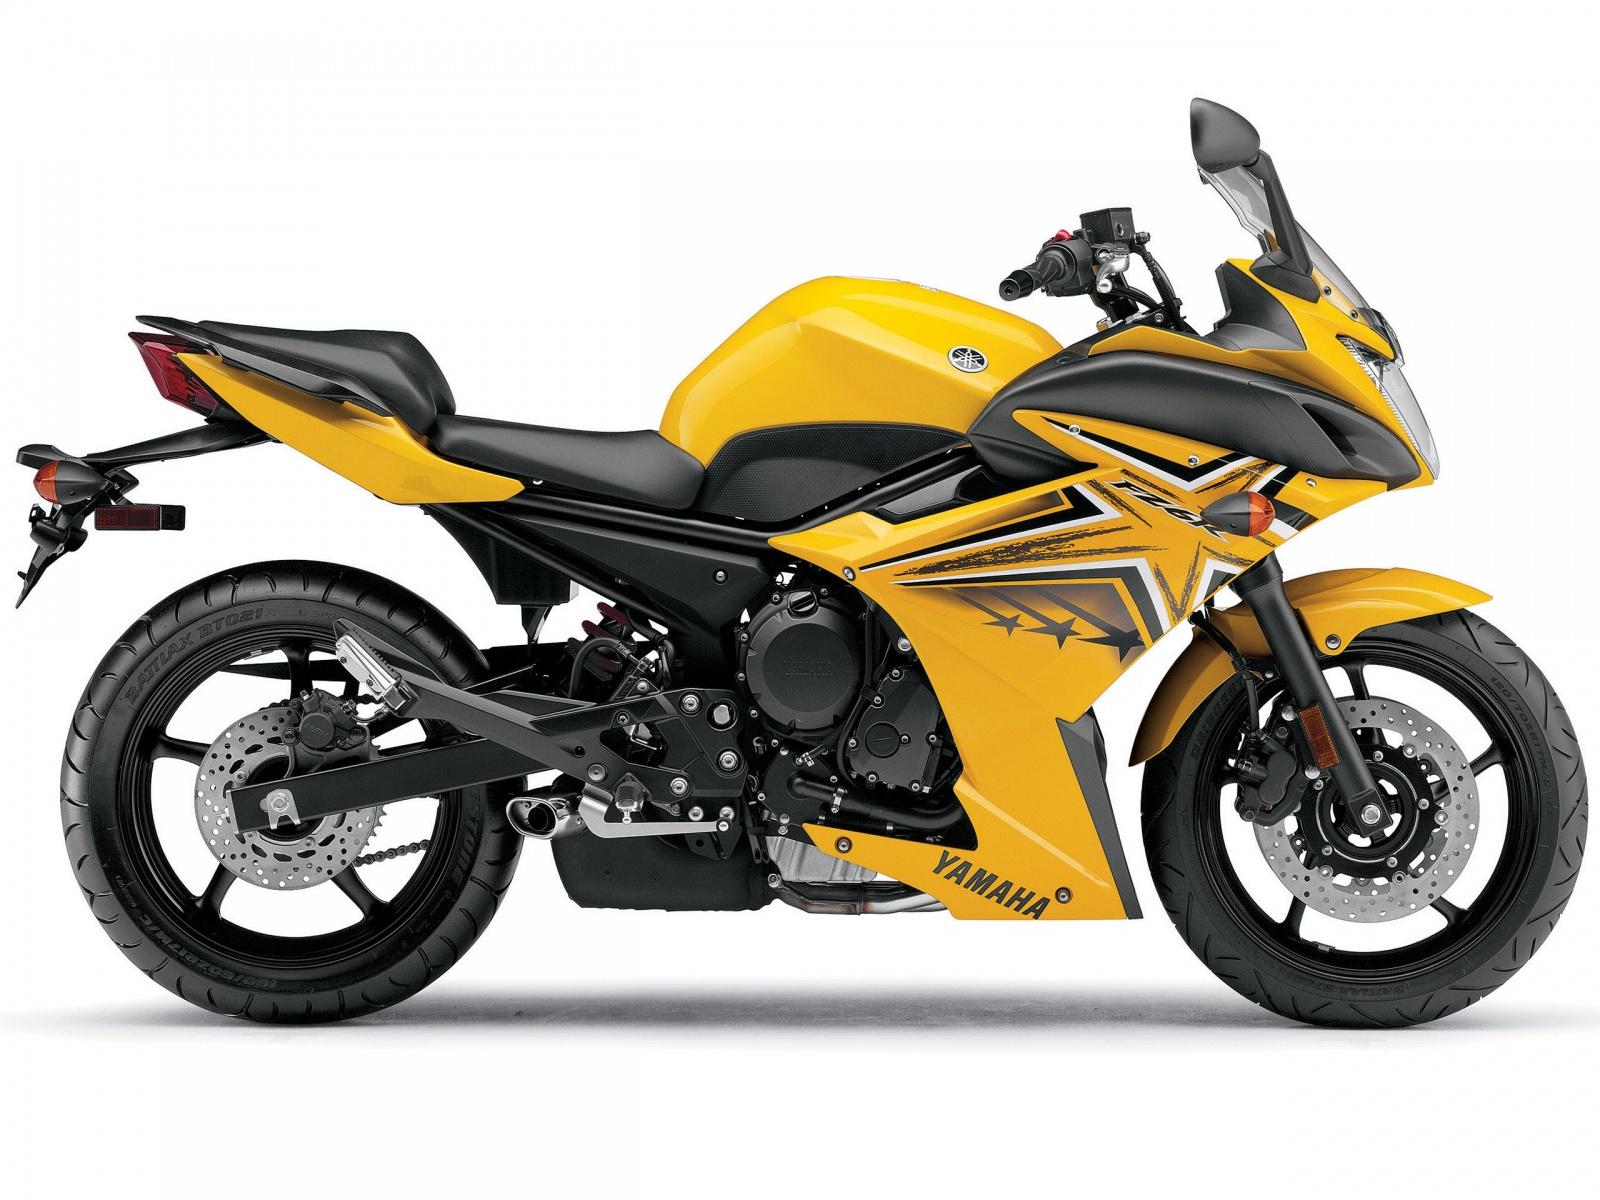 Hd wallpaper yamaha bike - Http 4 Bp Blogspot Com U0q5wrdx6sg Umi0yrcdt0i Yamaha Fz6r Yellow Hd Wallpapers